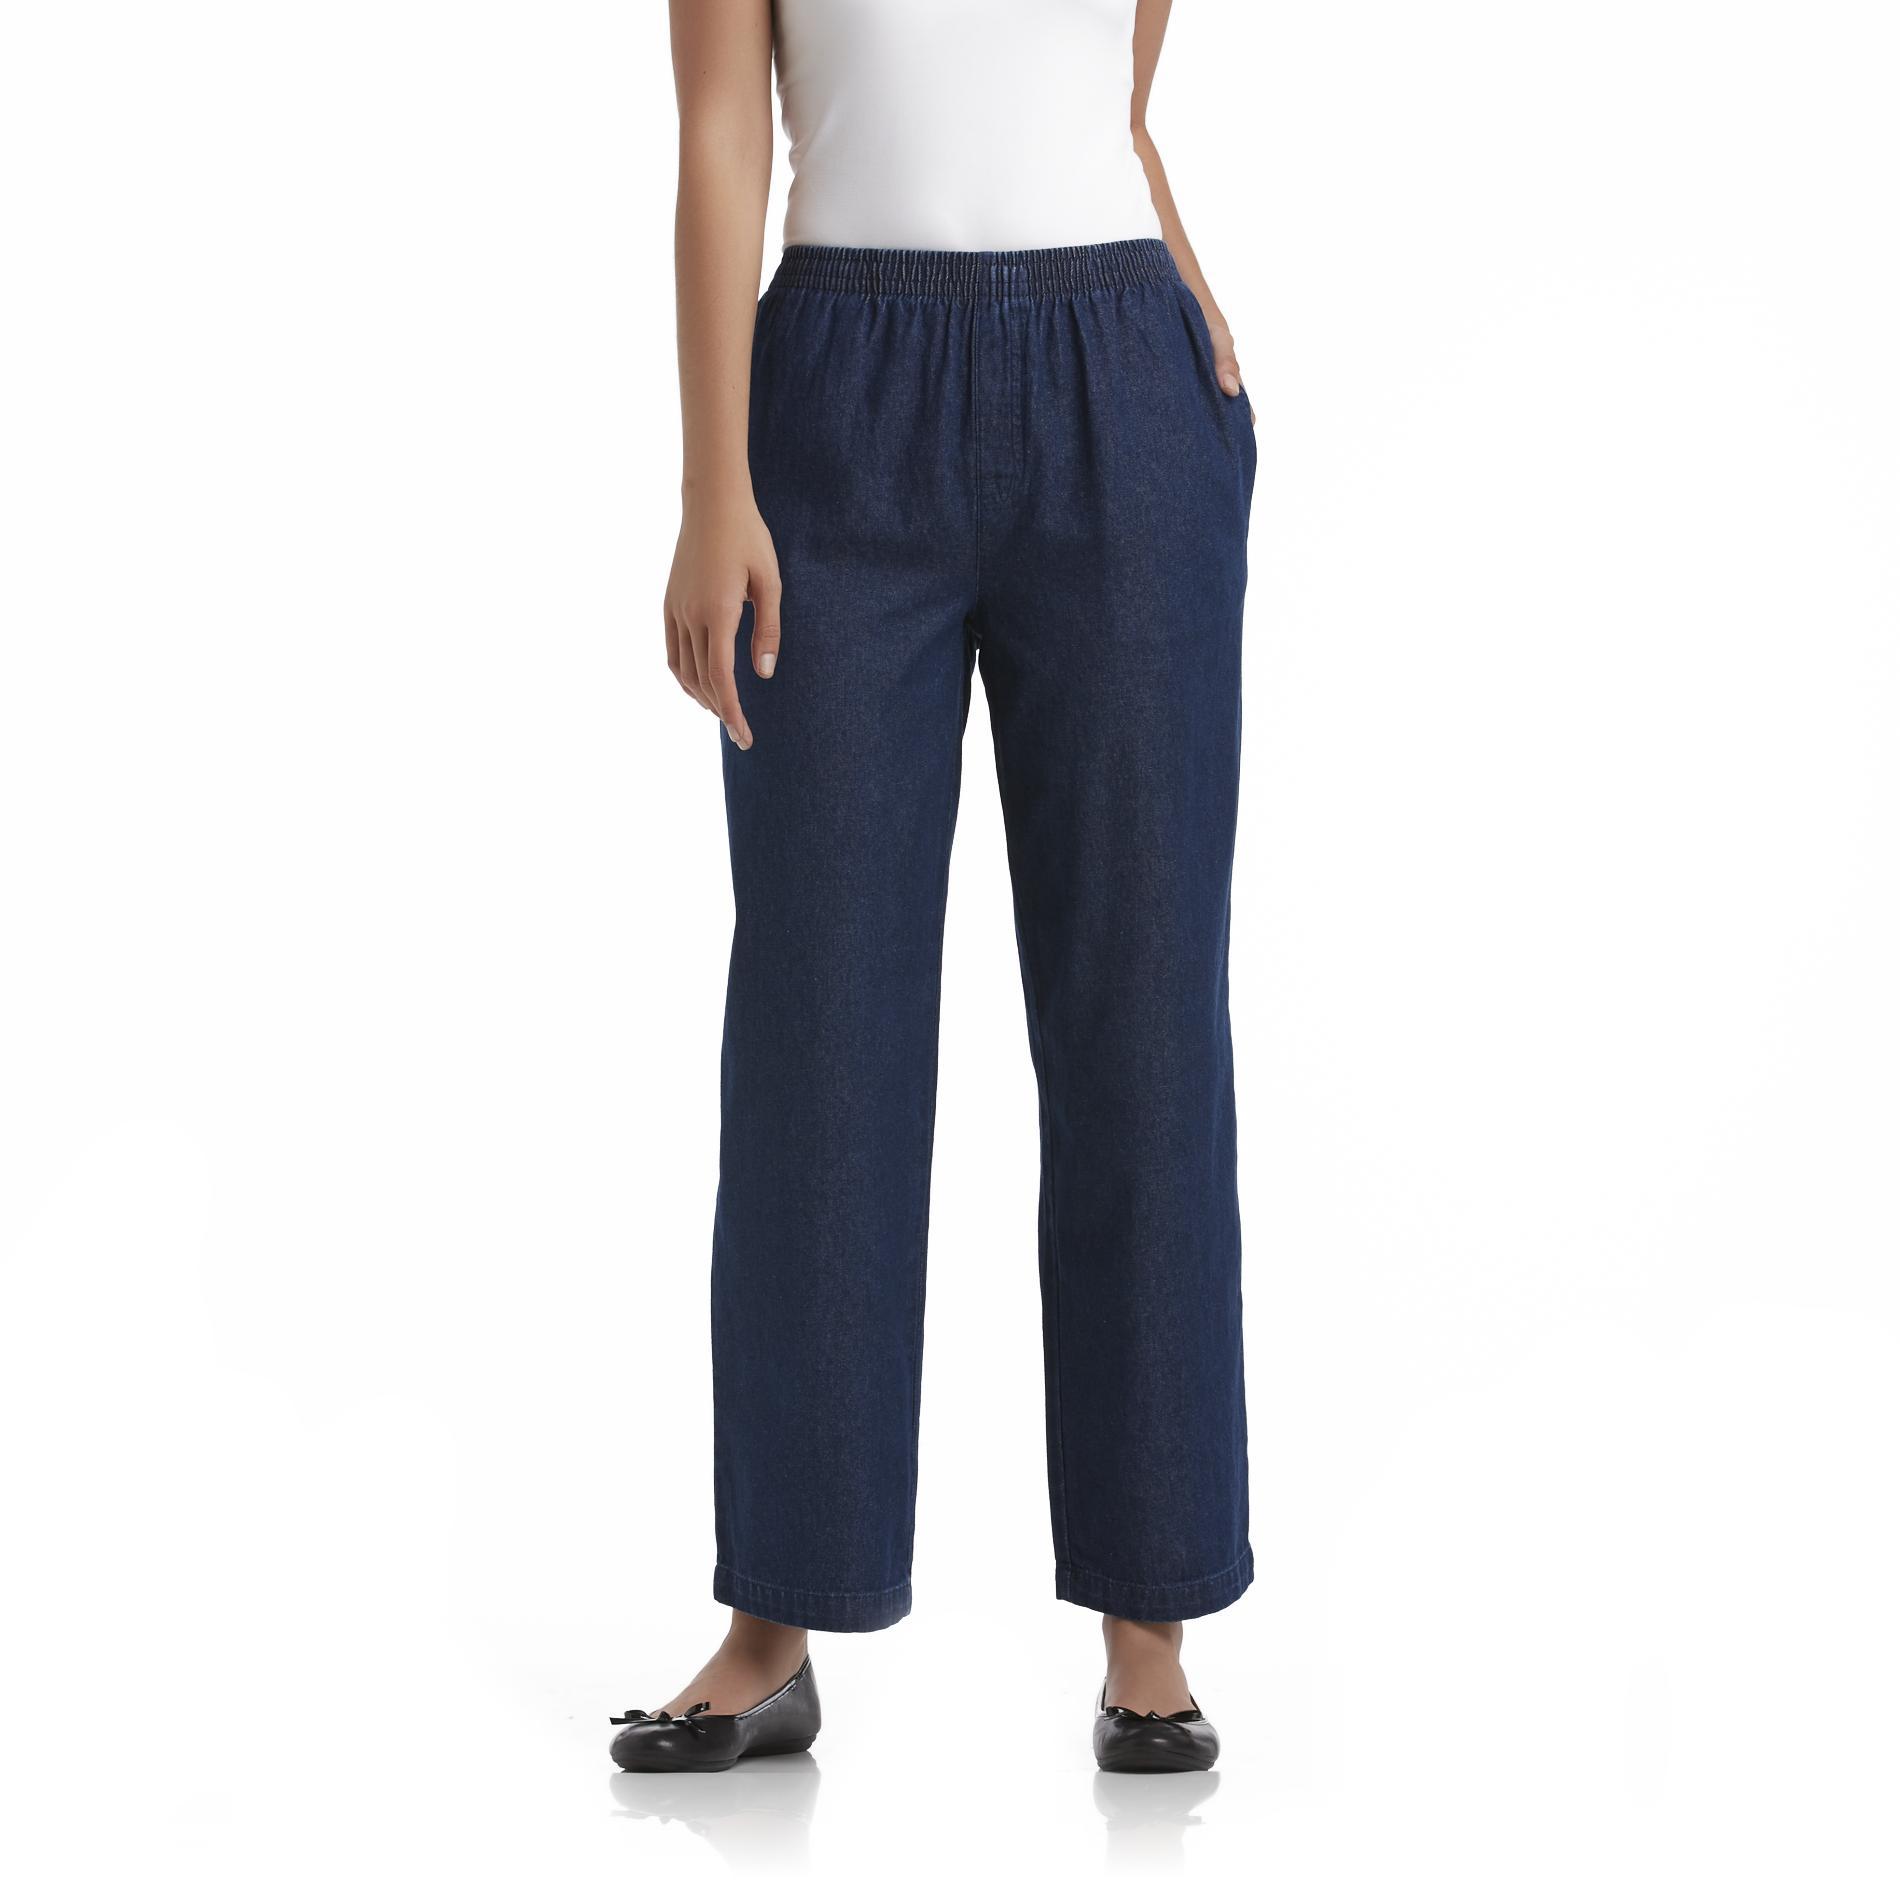 Basic Editions Womens Denim Pants